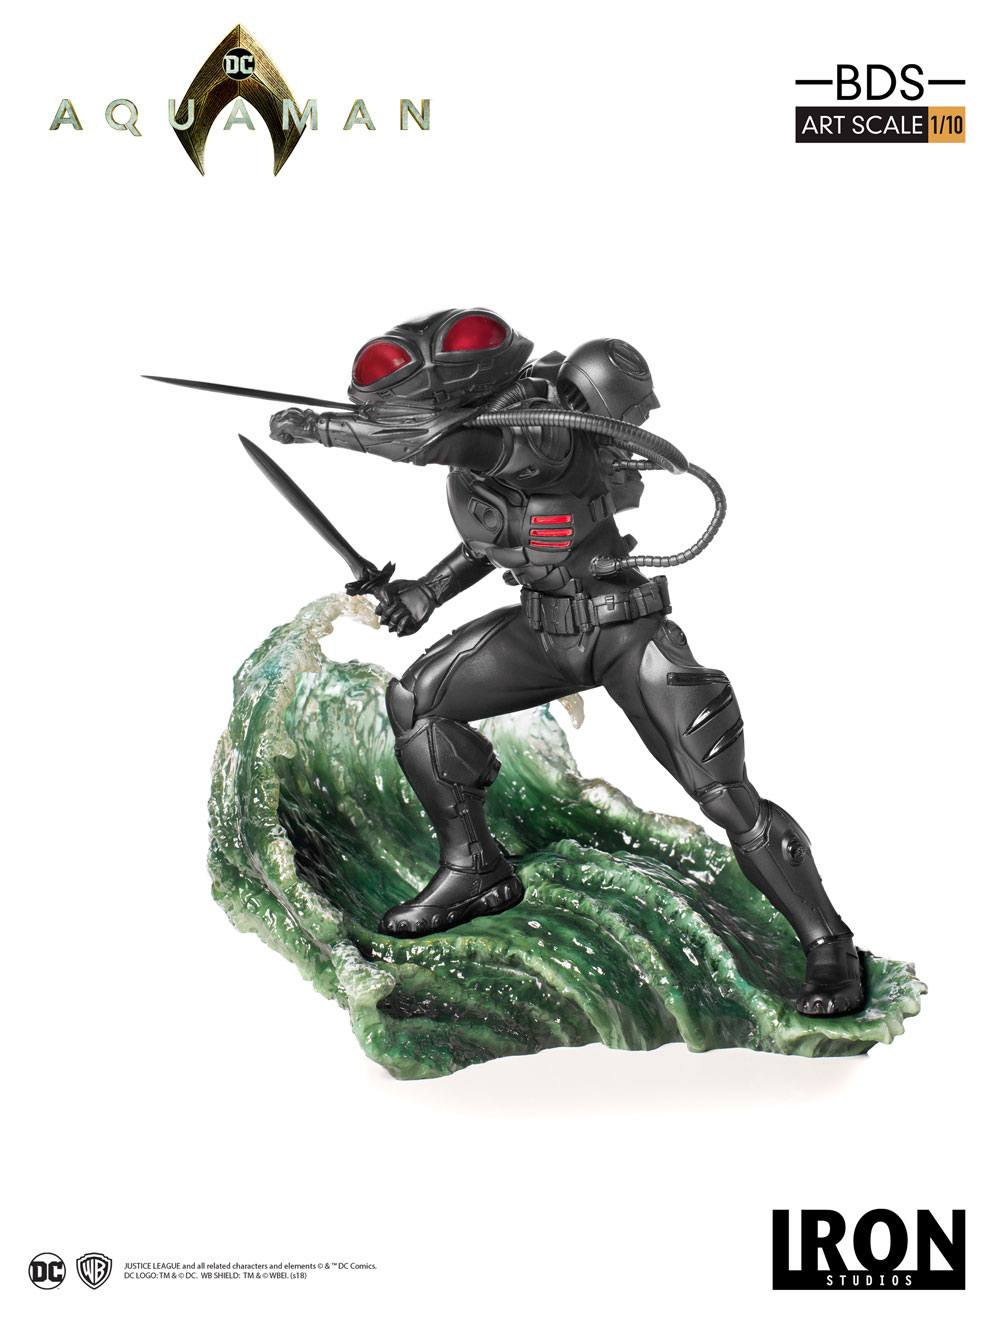 Aquaman BDS Art Scale Statue 1/10 Black Manta 20 cm